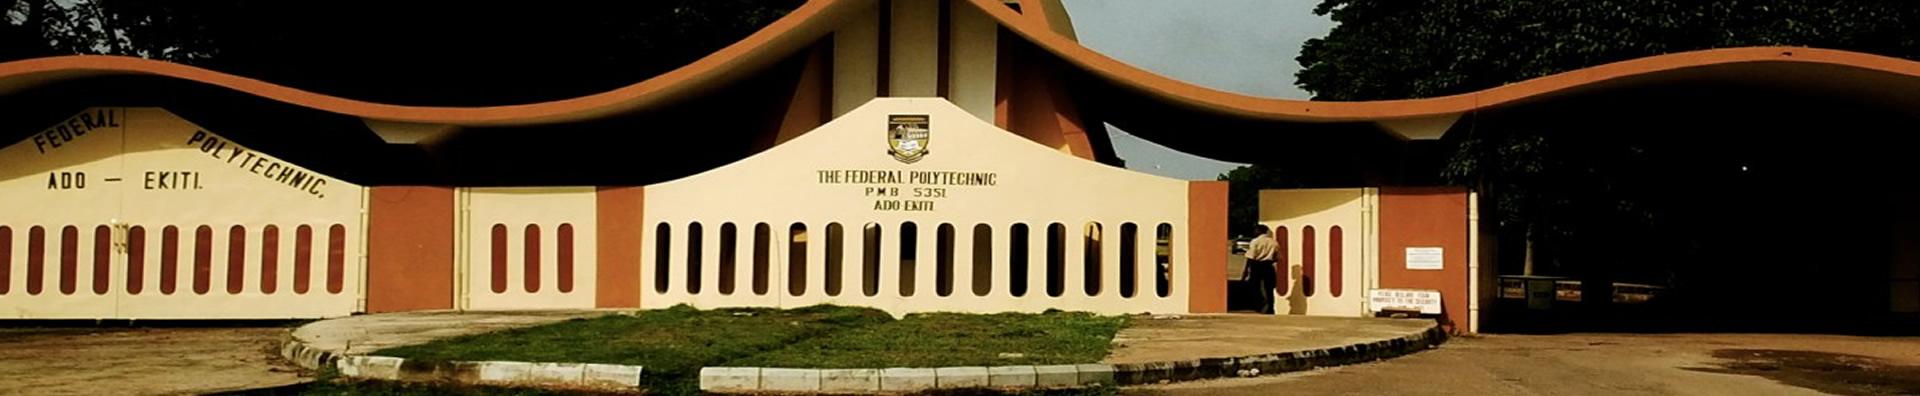 Federal Polytechnic, Ado-Ekiti Announces Four New Appointments